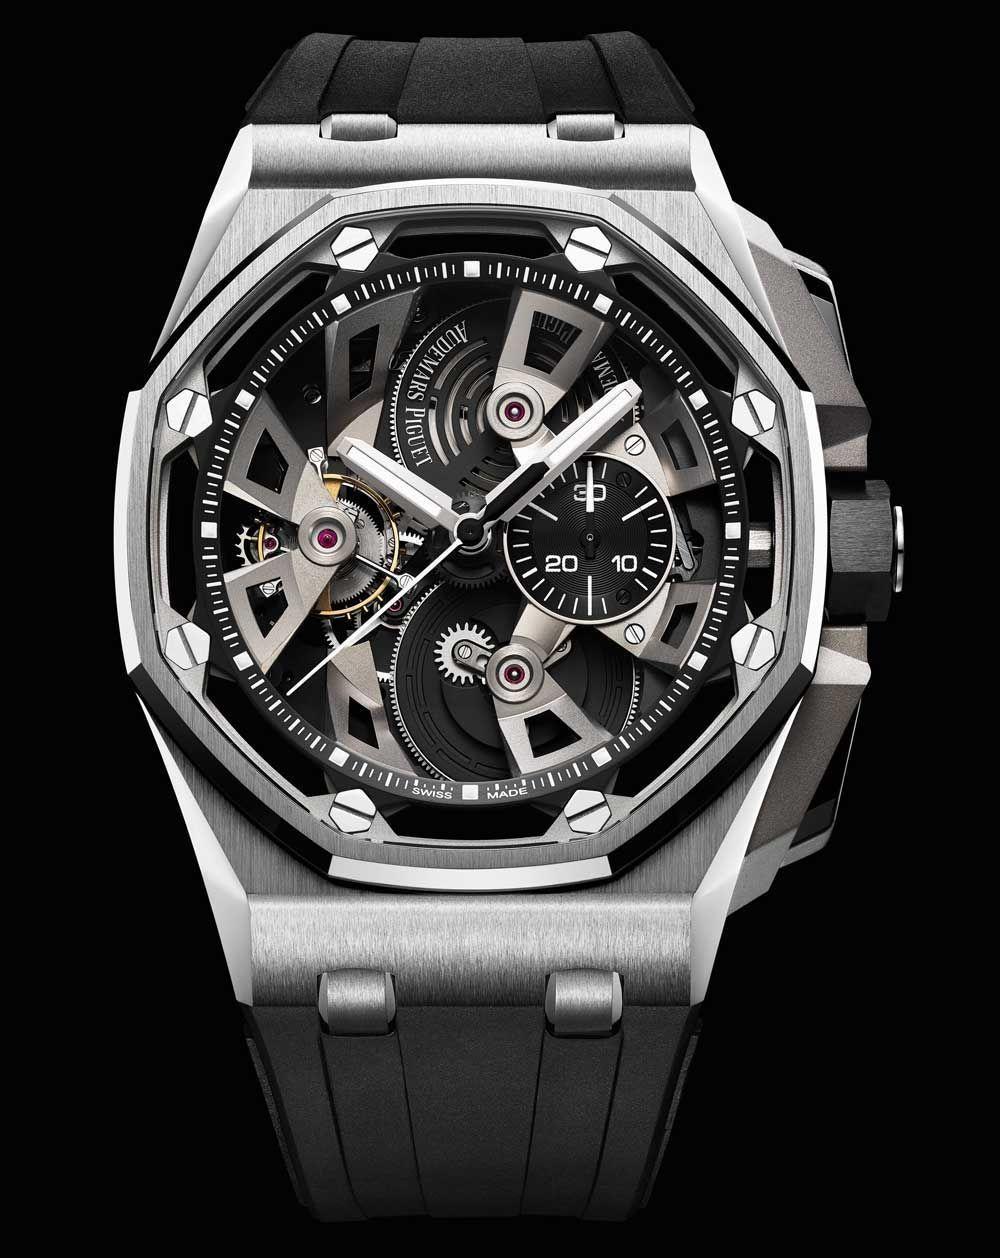 1a5c3dc4a222 Audemars Piguet Royal Oak Offshore Tourbillon Chronograph 25th Anniversary  Watch Watch Releases